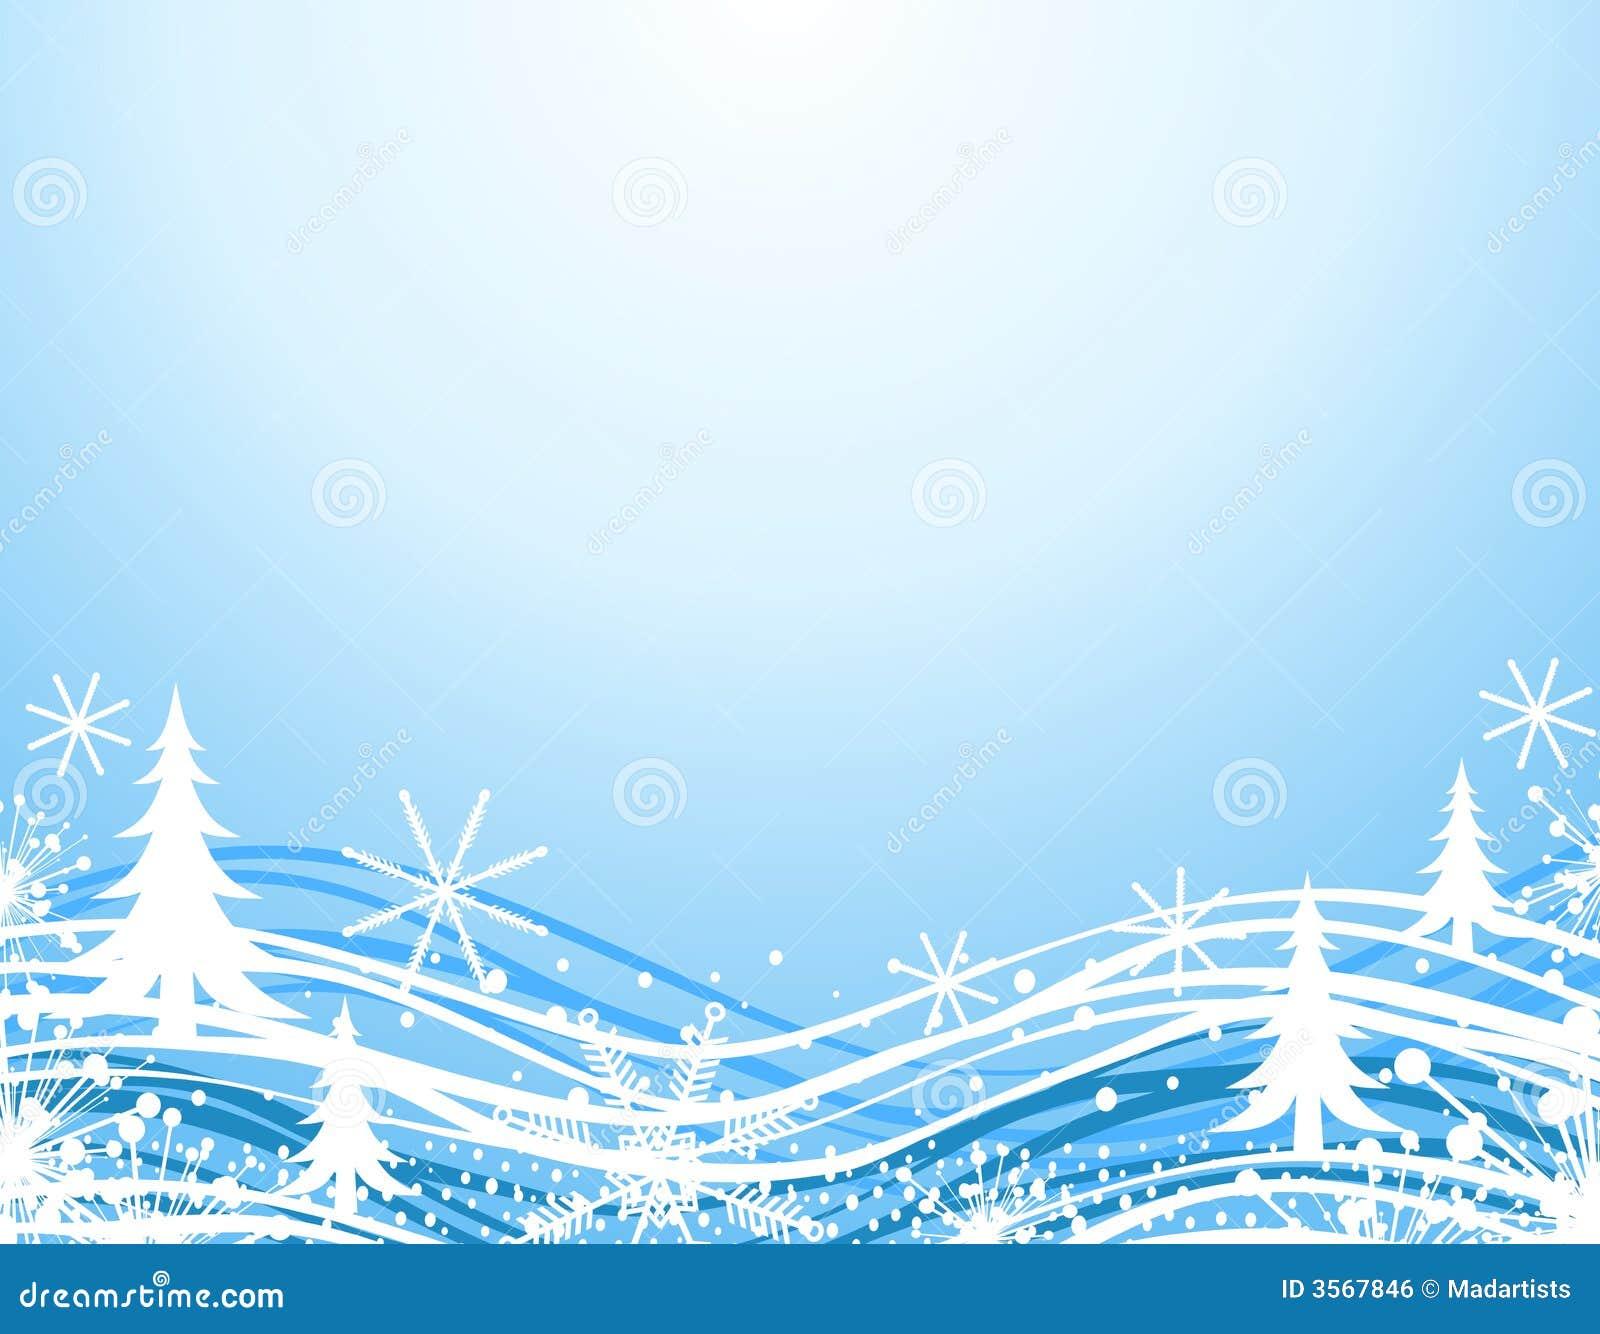 Blue Winter Christmas Border Royalty Free Stock Image - Image: 3567846